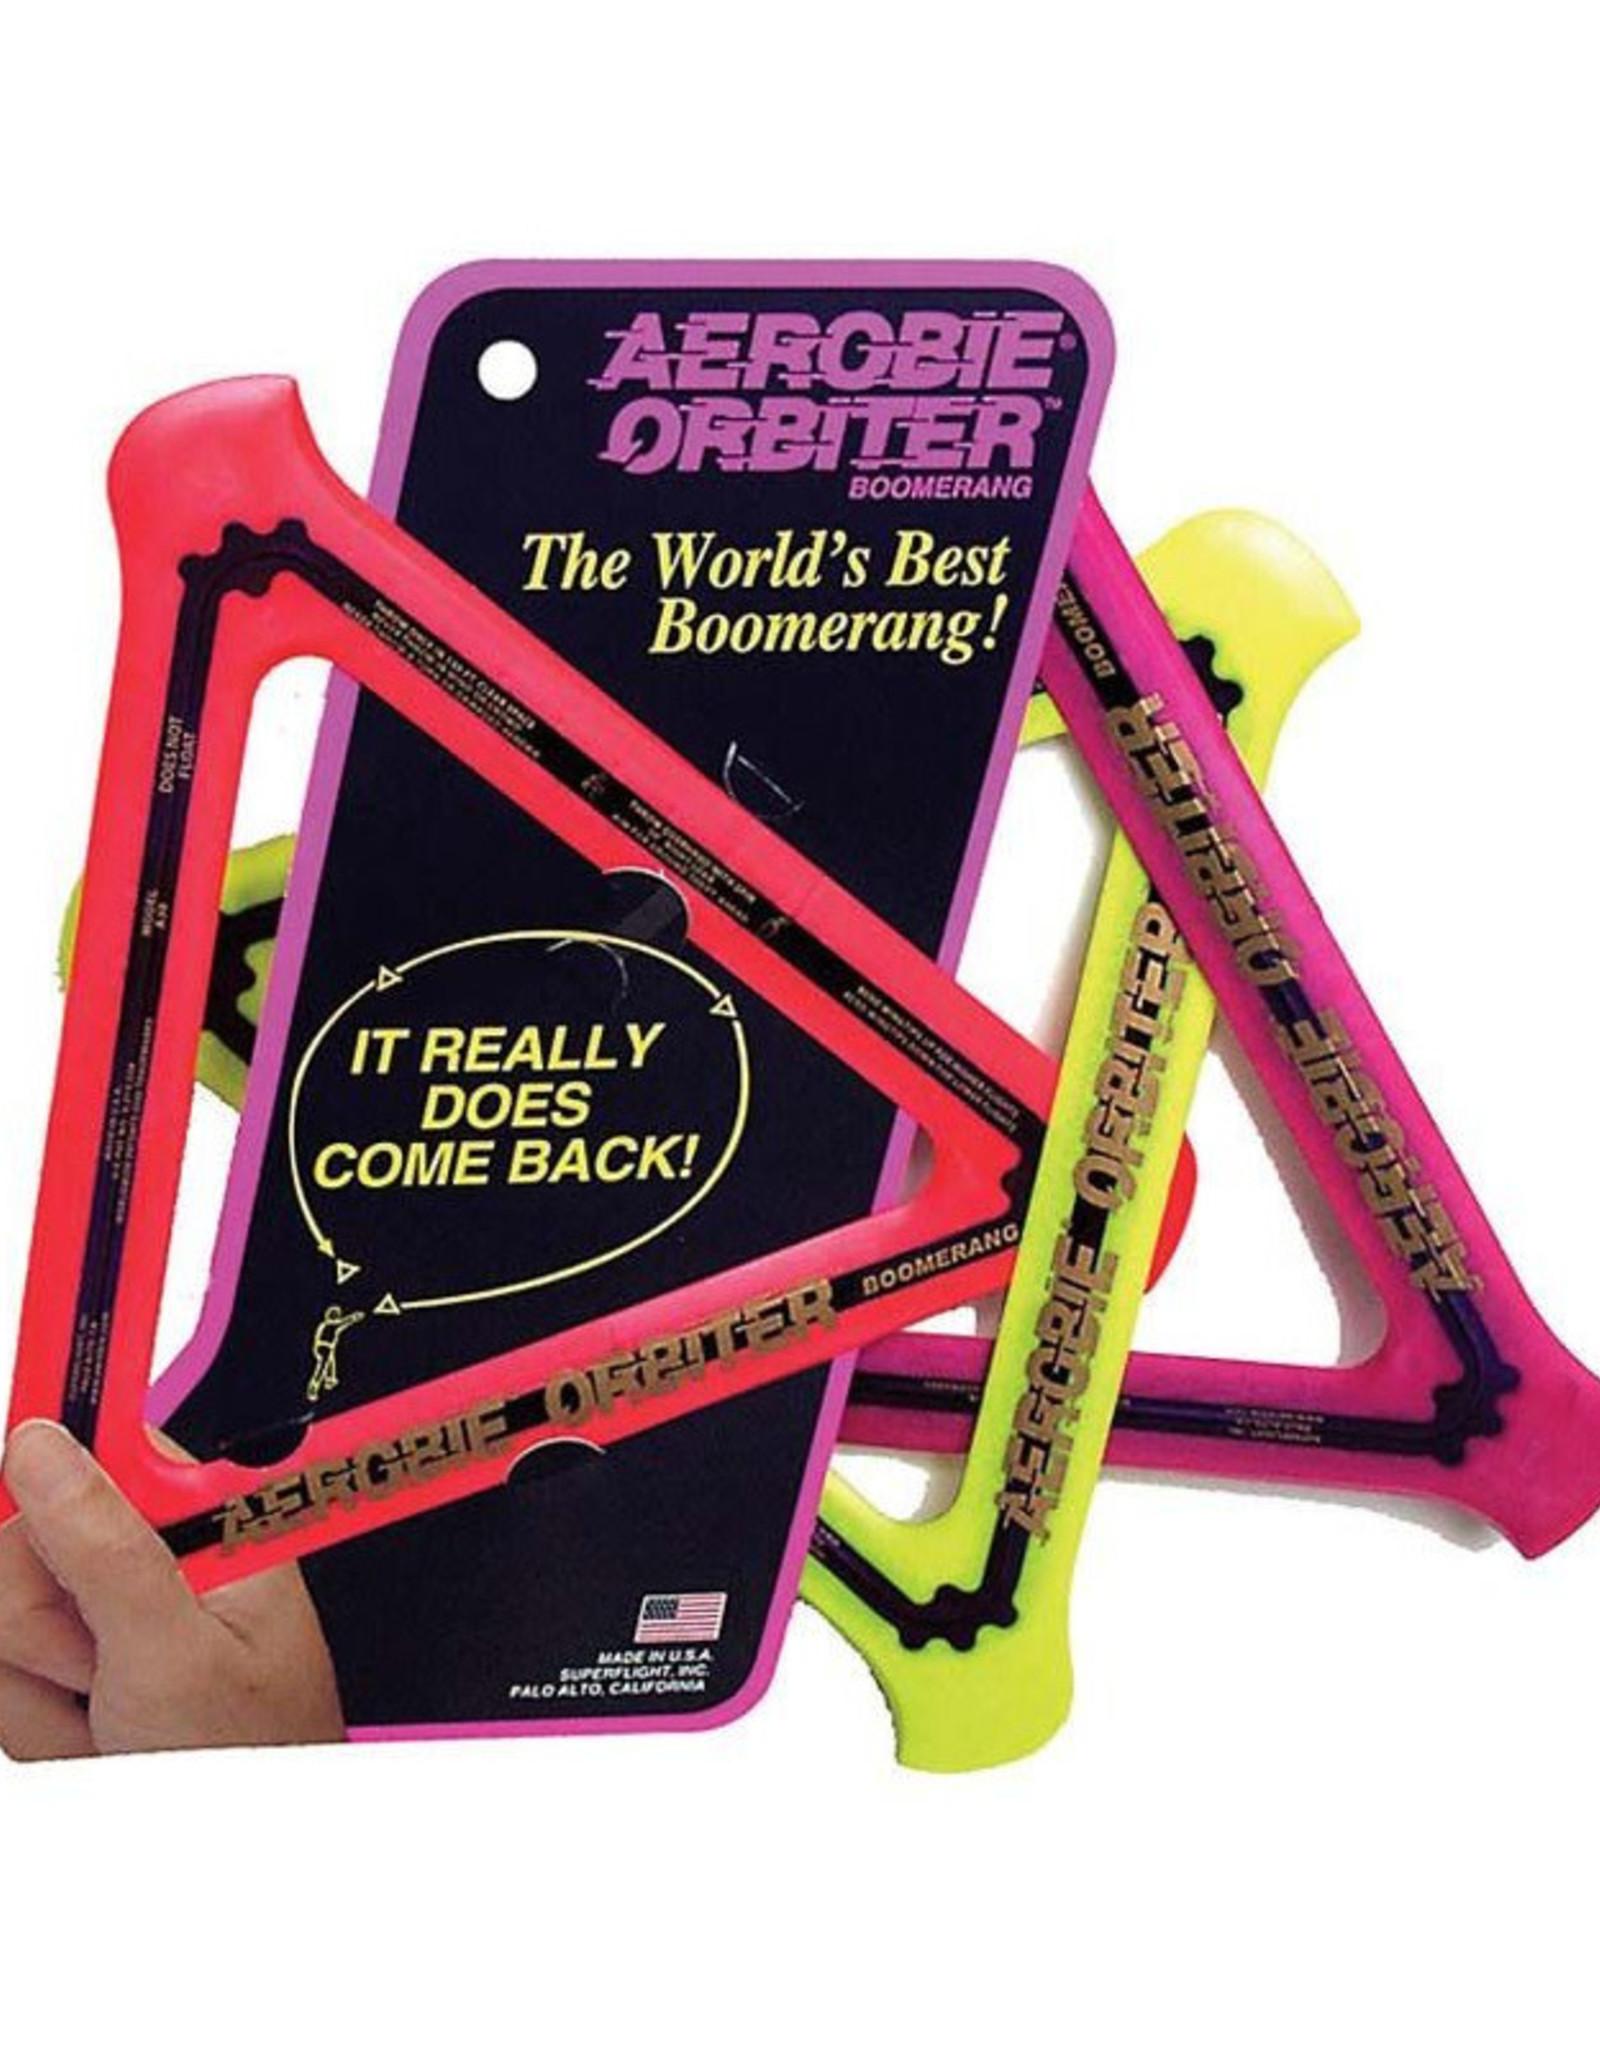 Aerobie Boomerang Orbiter